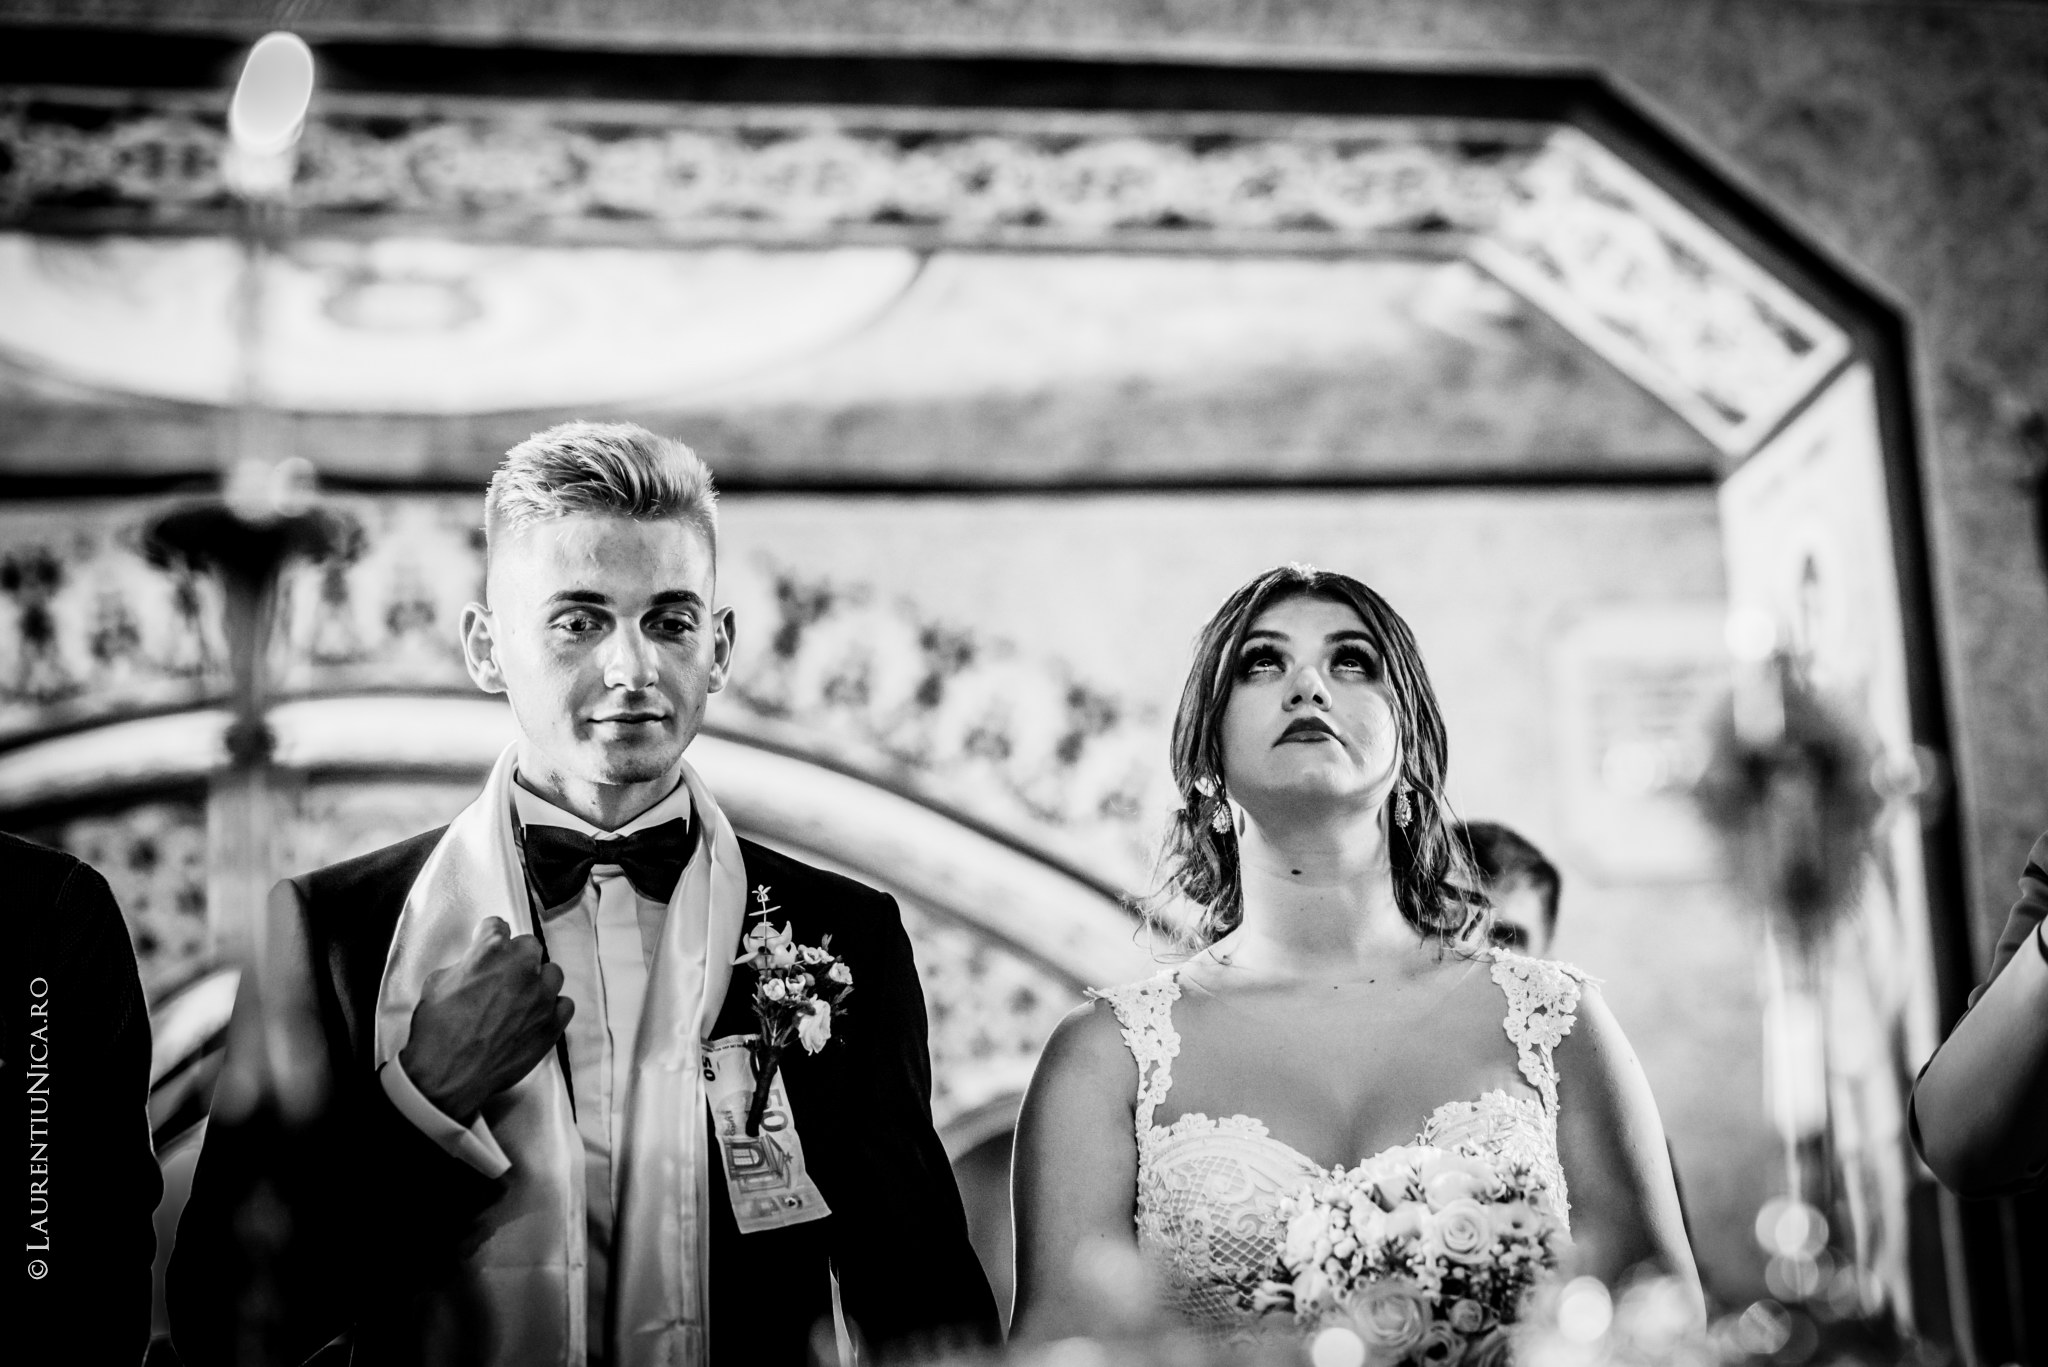 fotografii nunta Roxana si Cosmin fotograf nunta laurentiu nica 21 - Roxana & Cosmin | Fotografii nunta | Ticleni, judetul Gorj